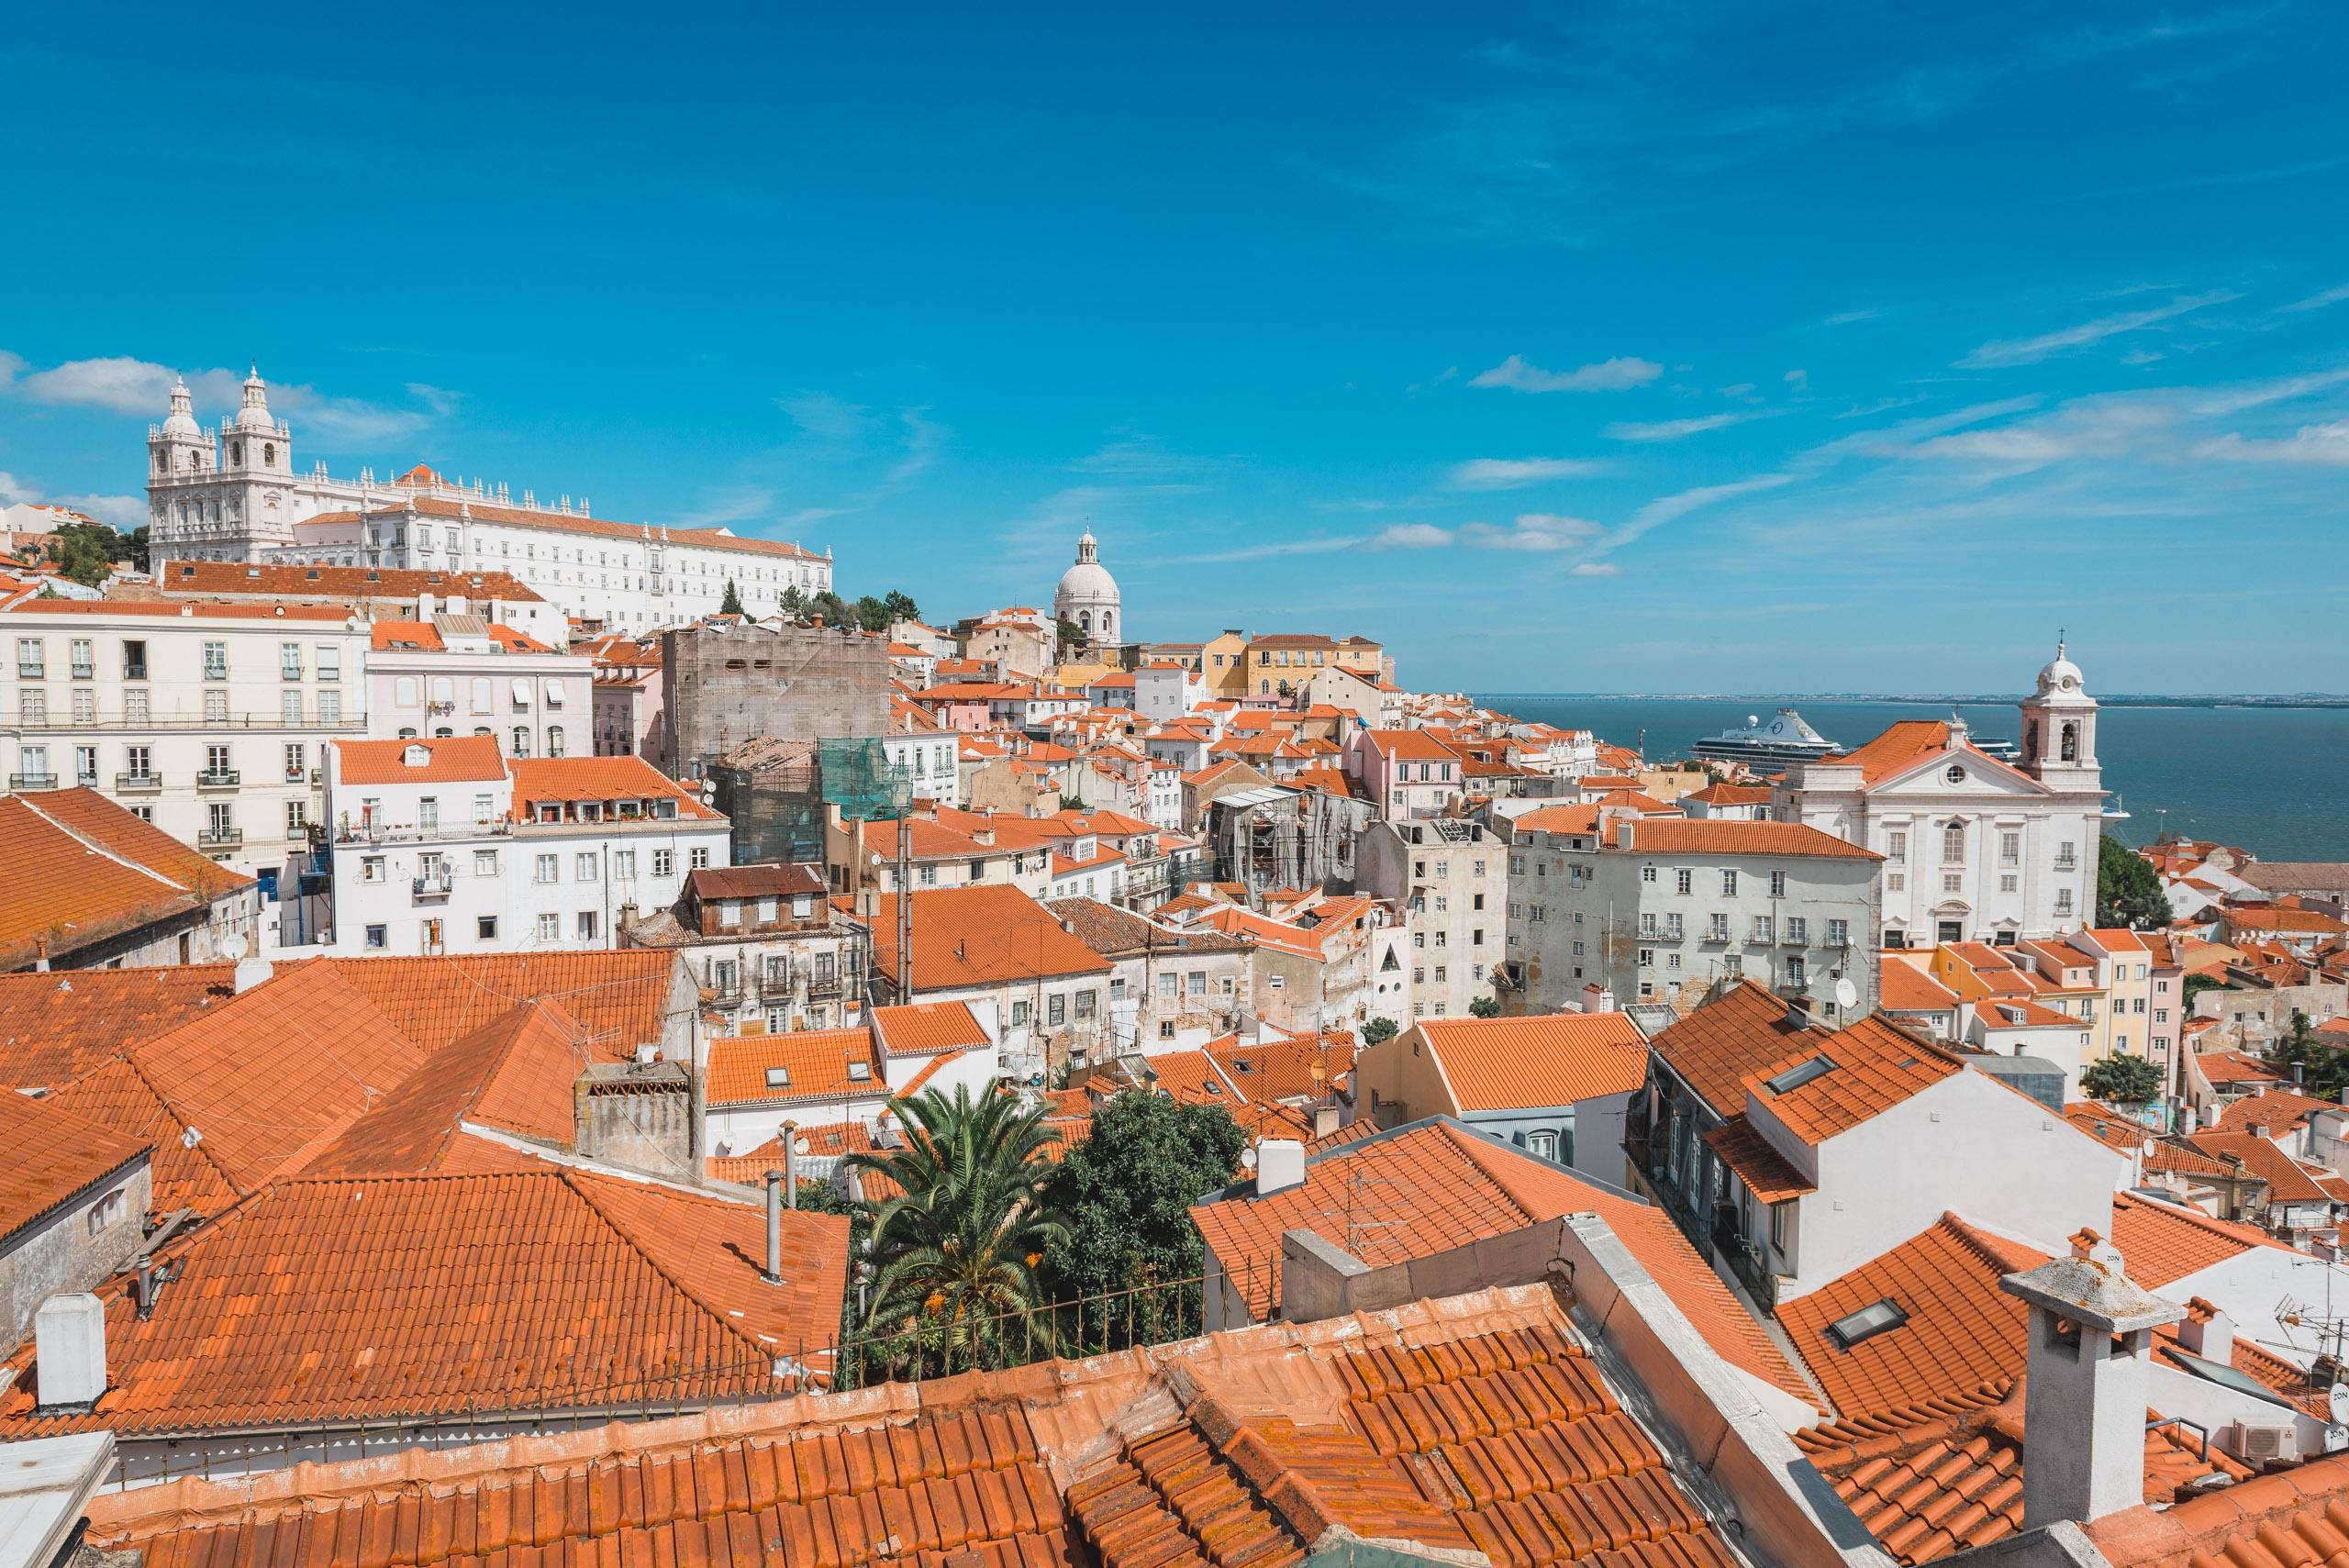 Portugal - Lisbon - 2012-0921-DSC_1387